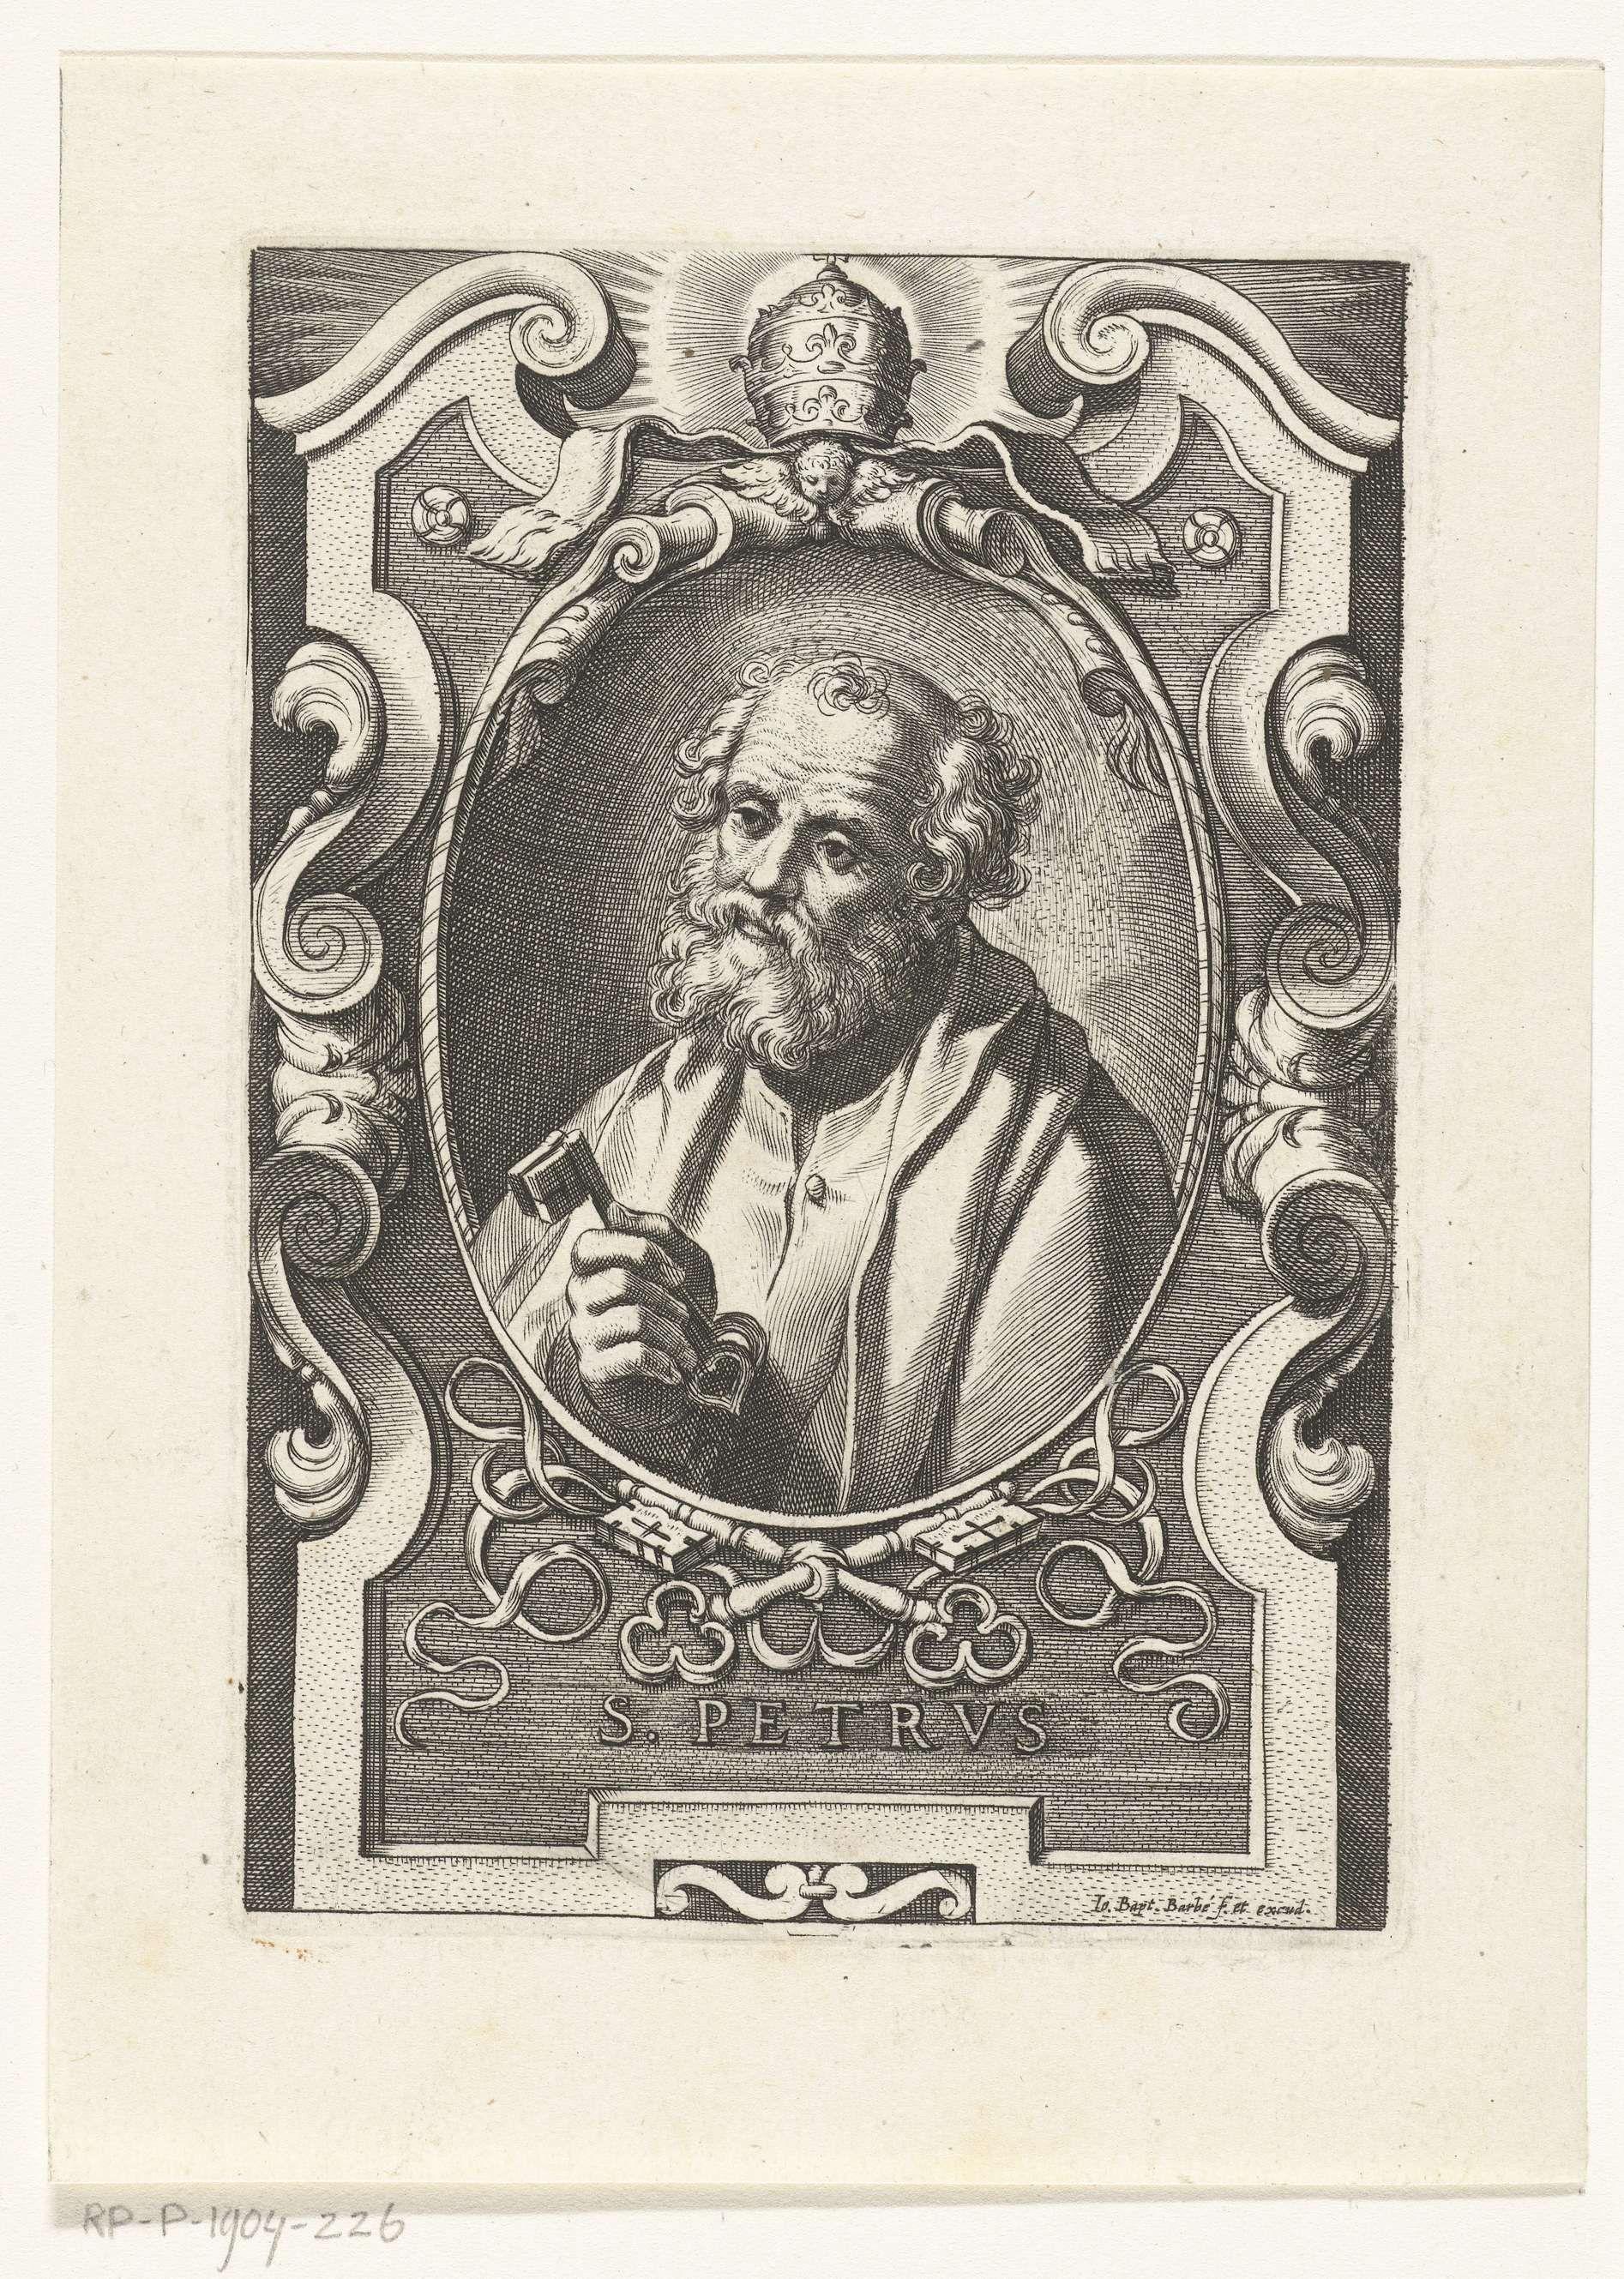 Jan-Baptist Barbé | Apostel Petrus met sleutels in omlijsting met architectuur ornamenten, Jan-Baptist Barbé, Theodor van Loon, 1588 - 1648 |